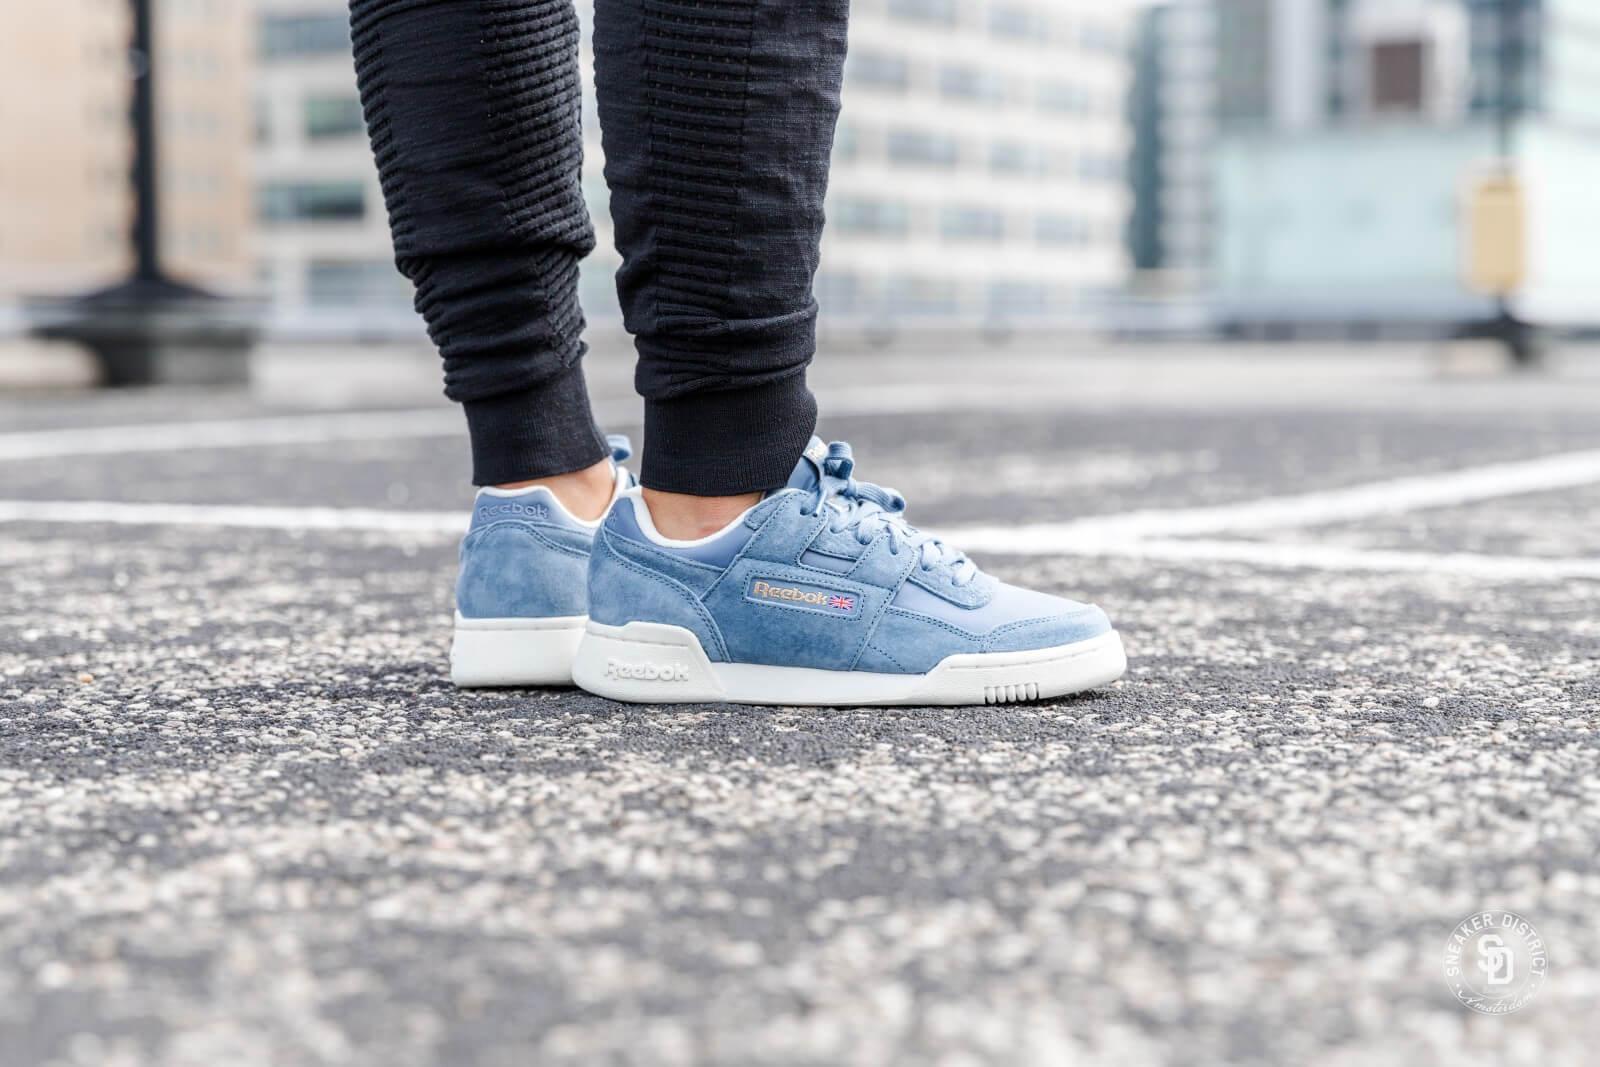 Reebok Women's Workout LO Plus Blue Sneaker District